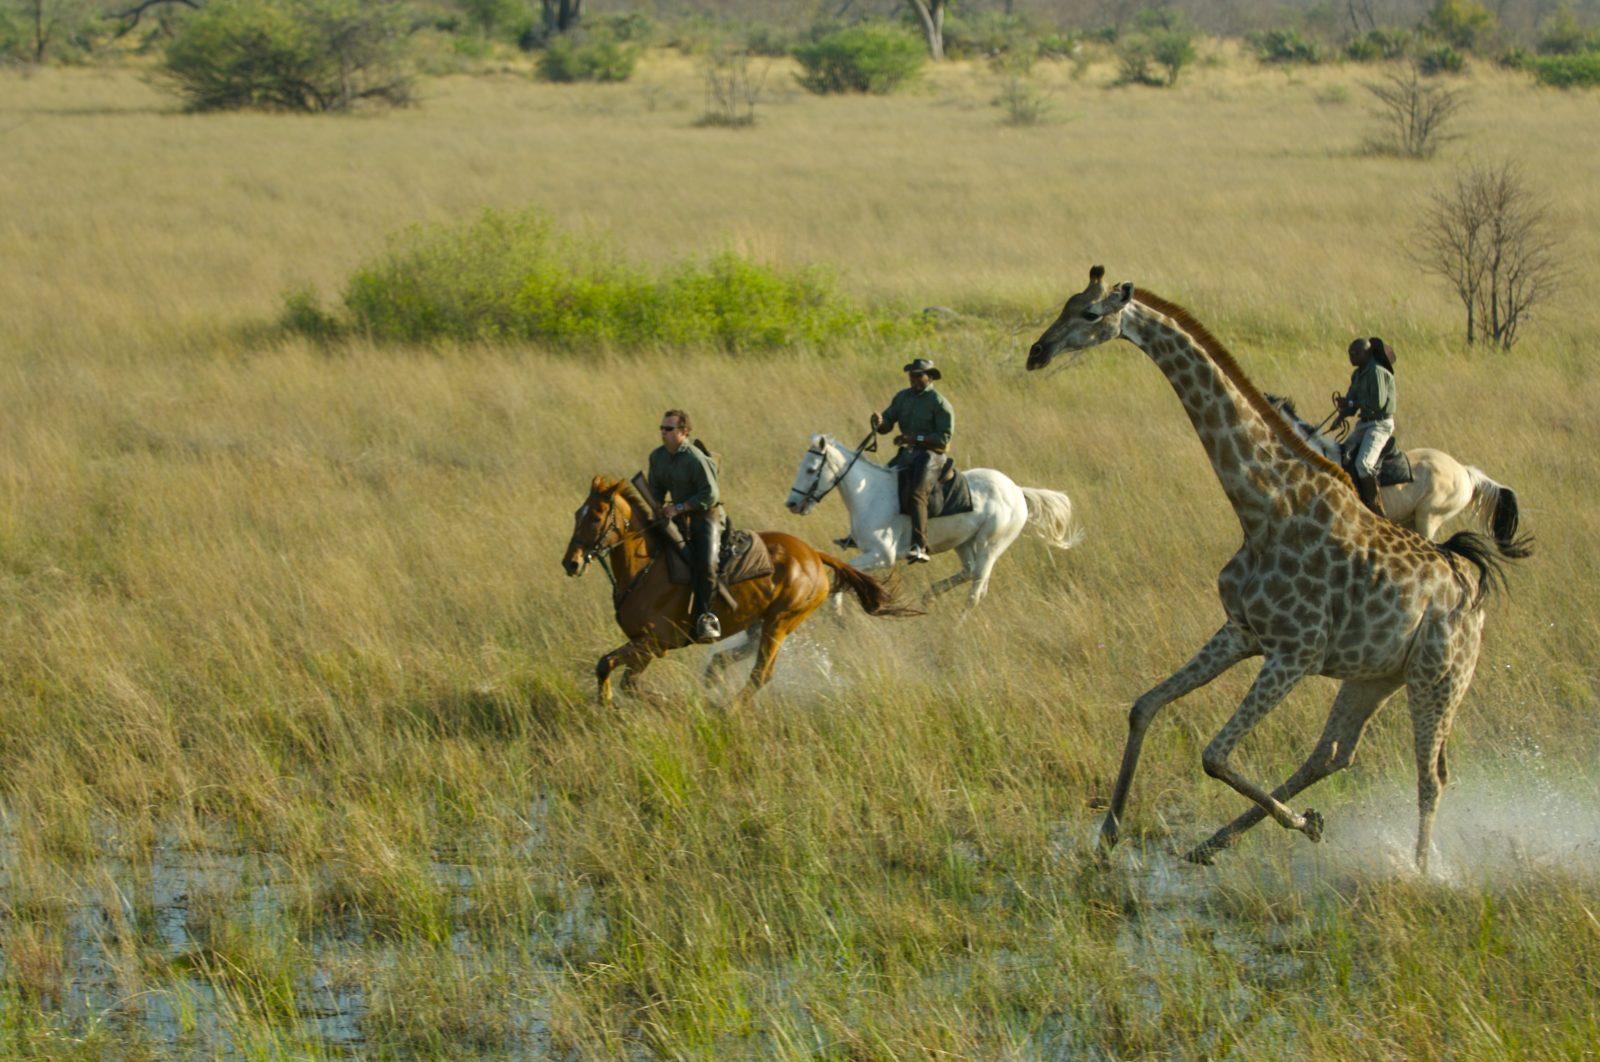 Cantering in the Okavango Delta with African Horseback Safaris